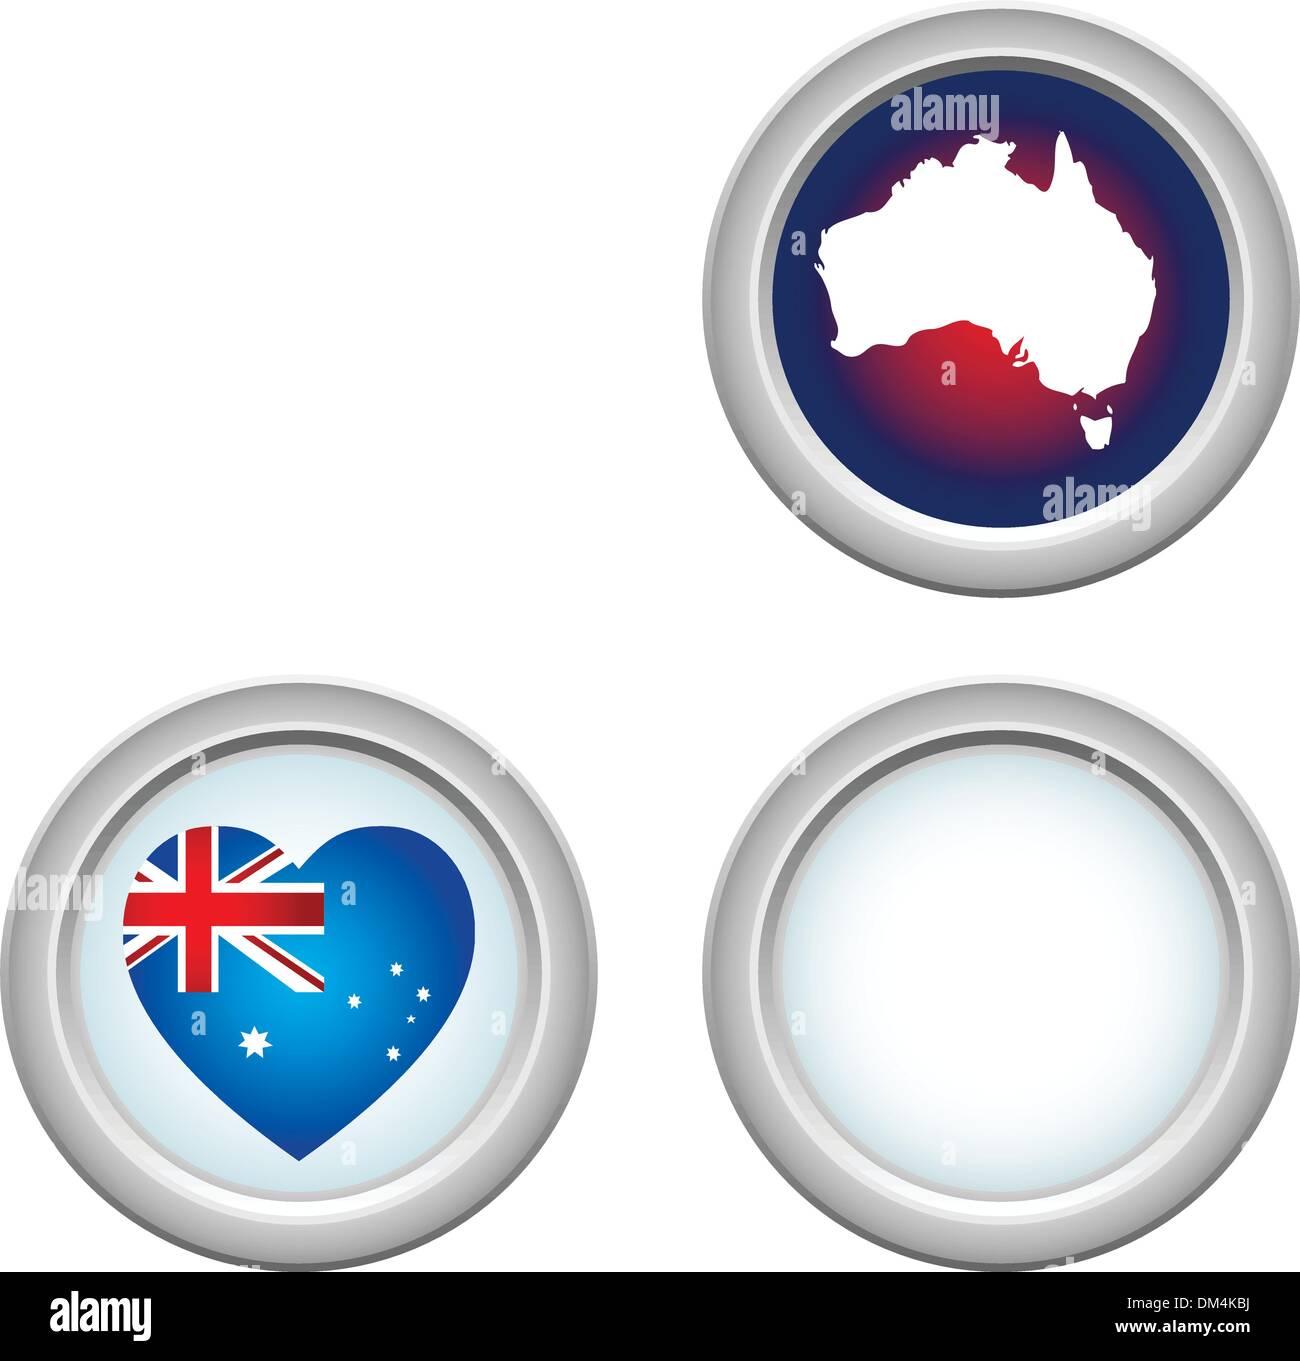 Australia Buttons - Stock Image